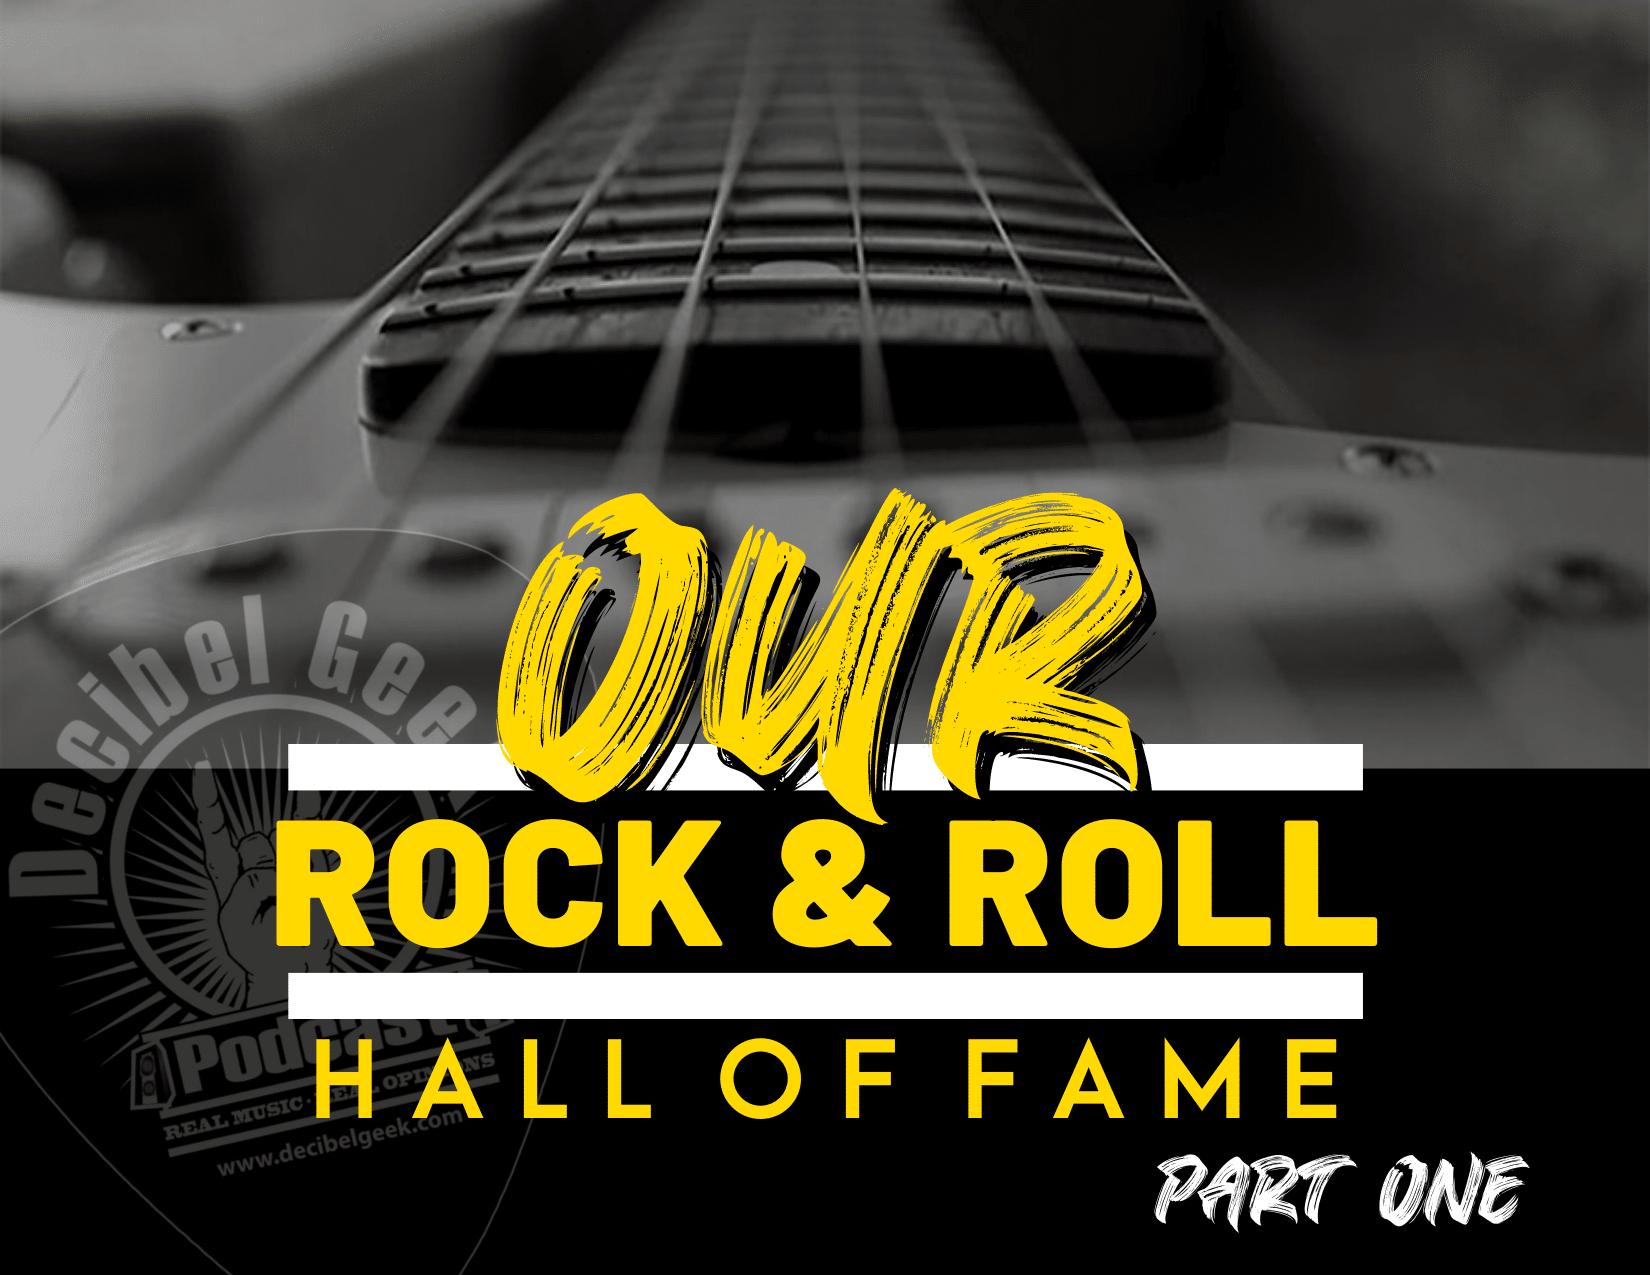 Rock & Roll Hall of Fame, decibel geek, podcast